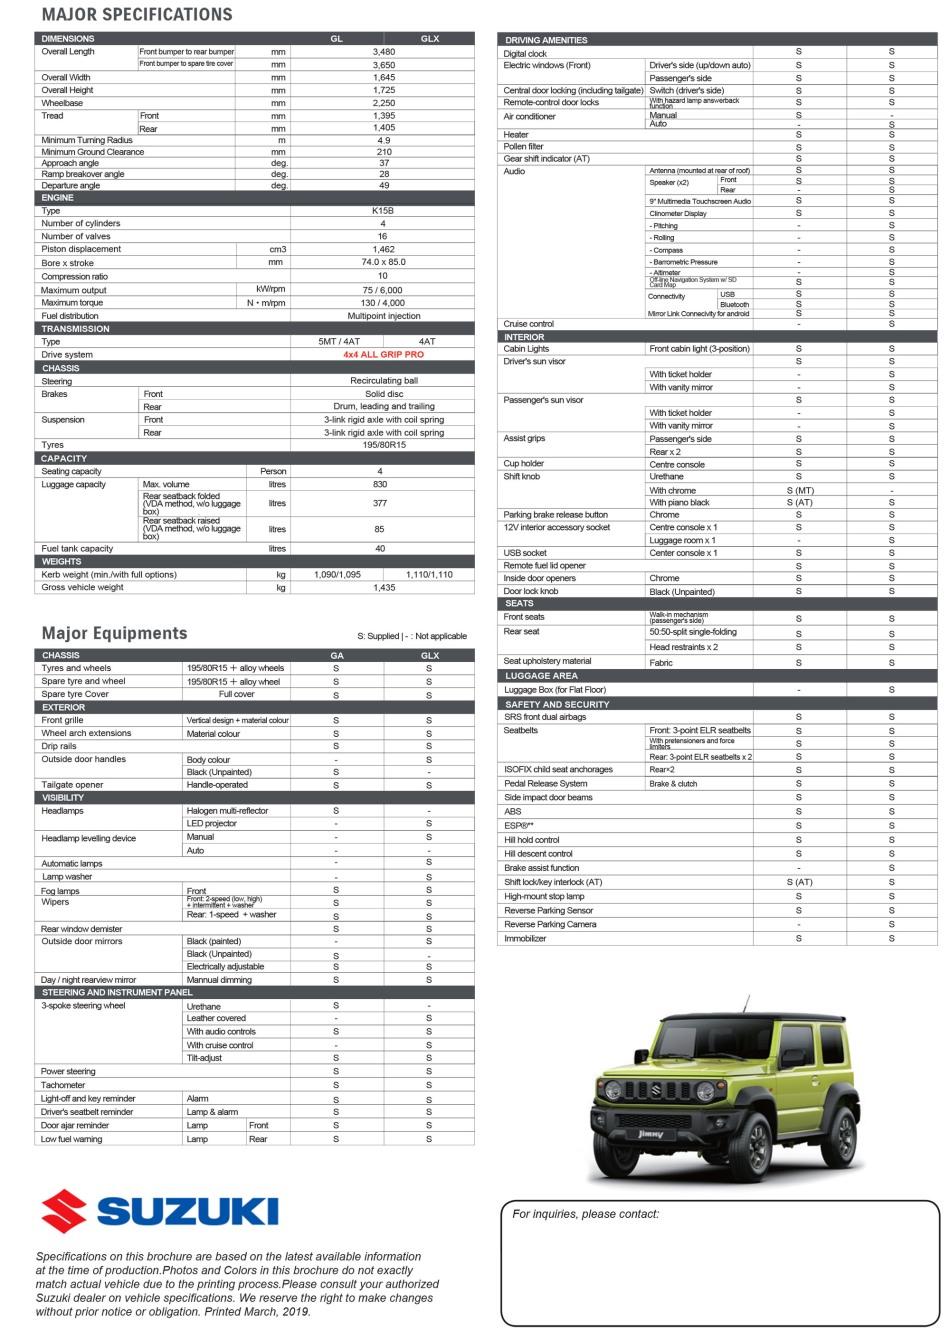 2019 Suzuki Jimny Brochure from Suzuki Philippines